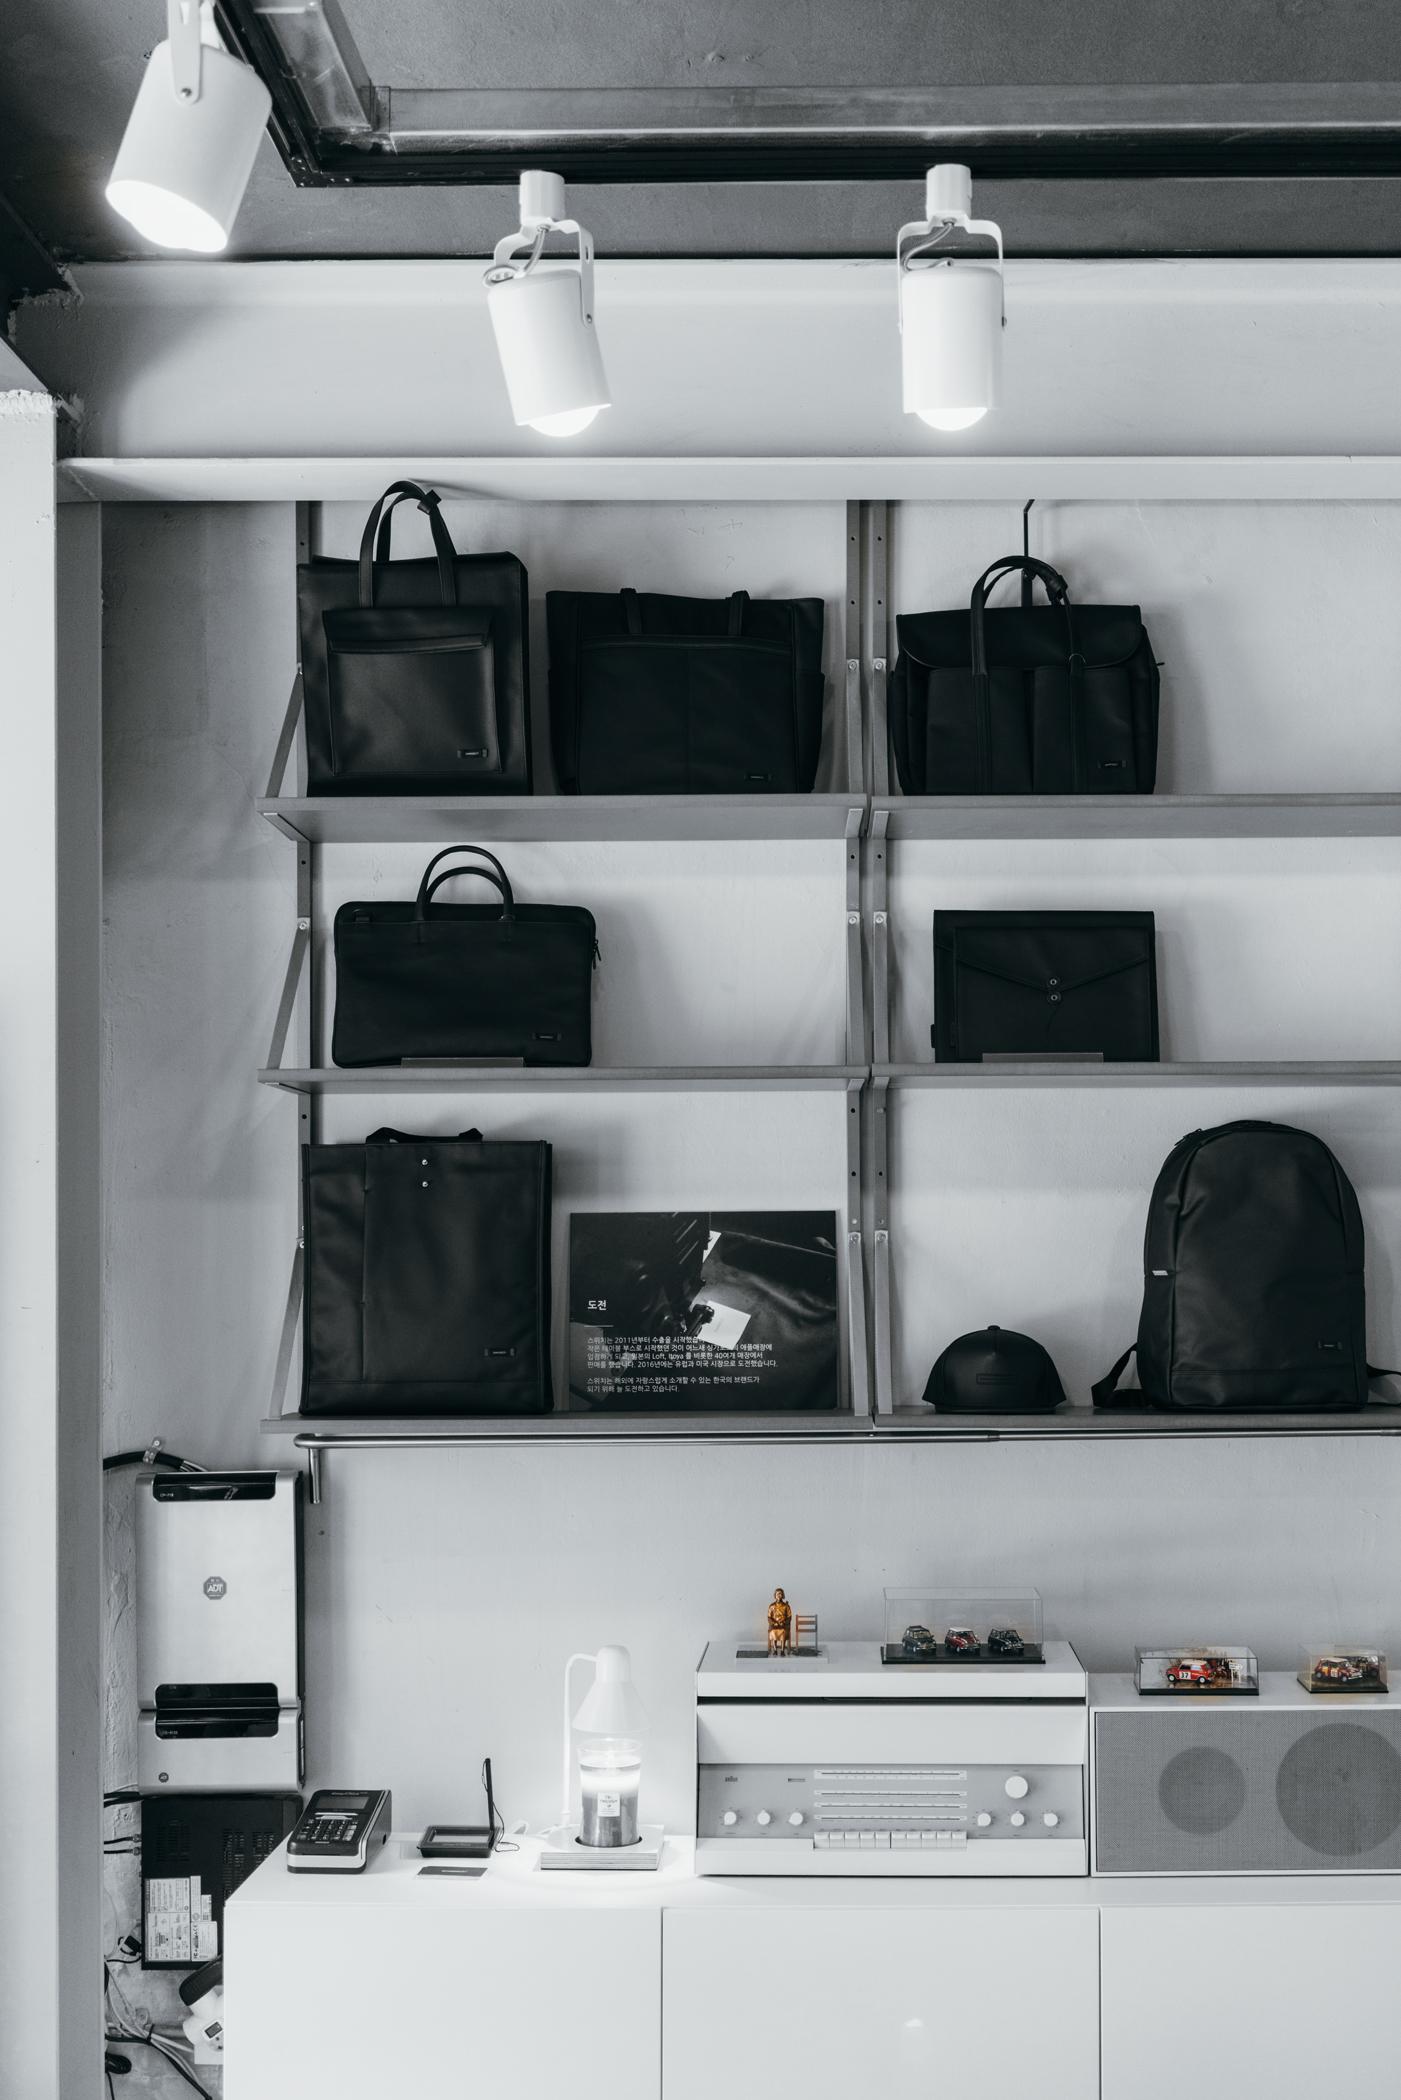 Greysuitcase Seoul Shops Series: Sweetch (스위치), Yeonhui-dong (연희동), Seoul, South Korea.